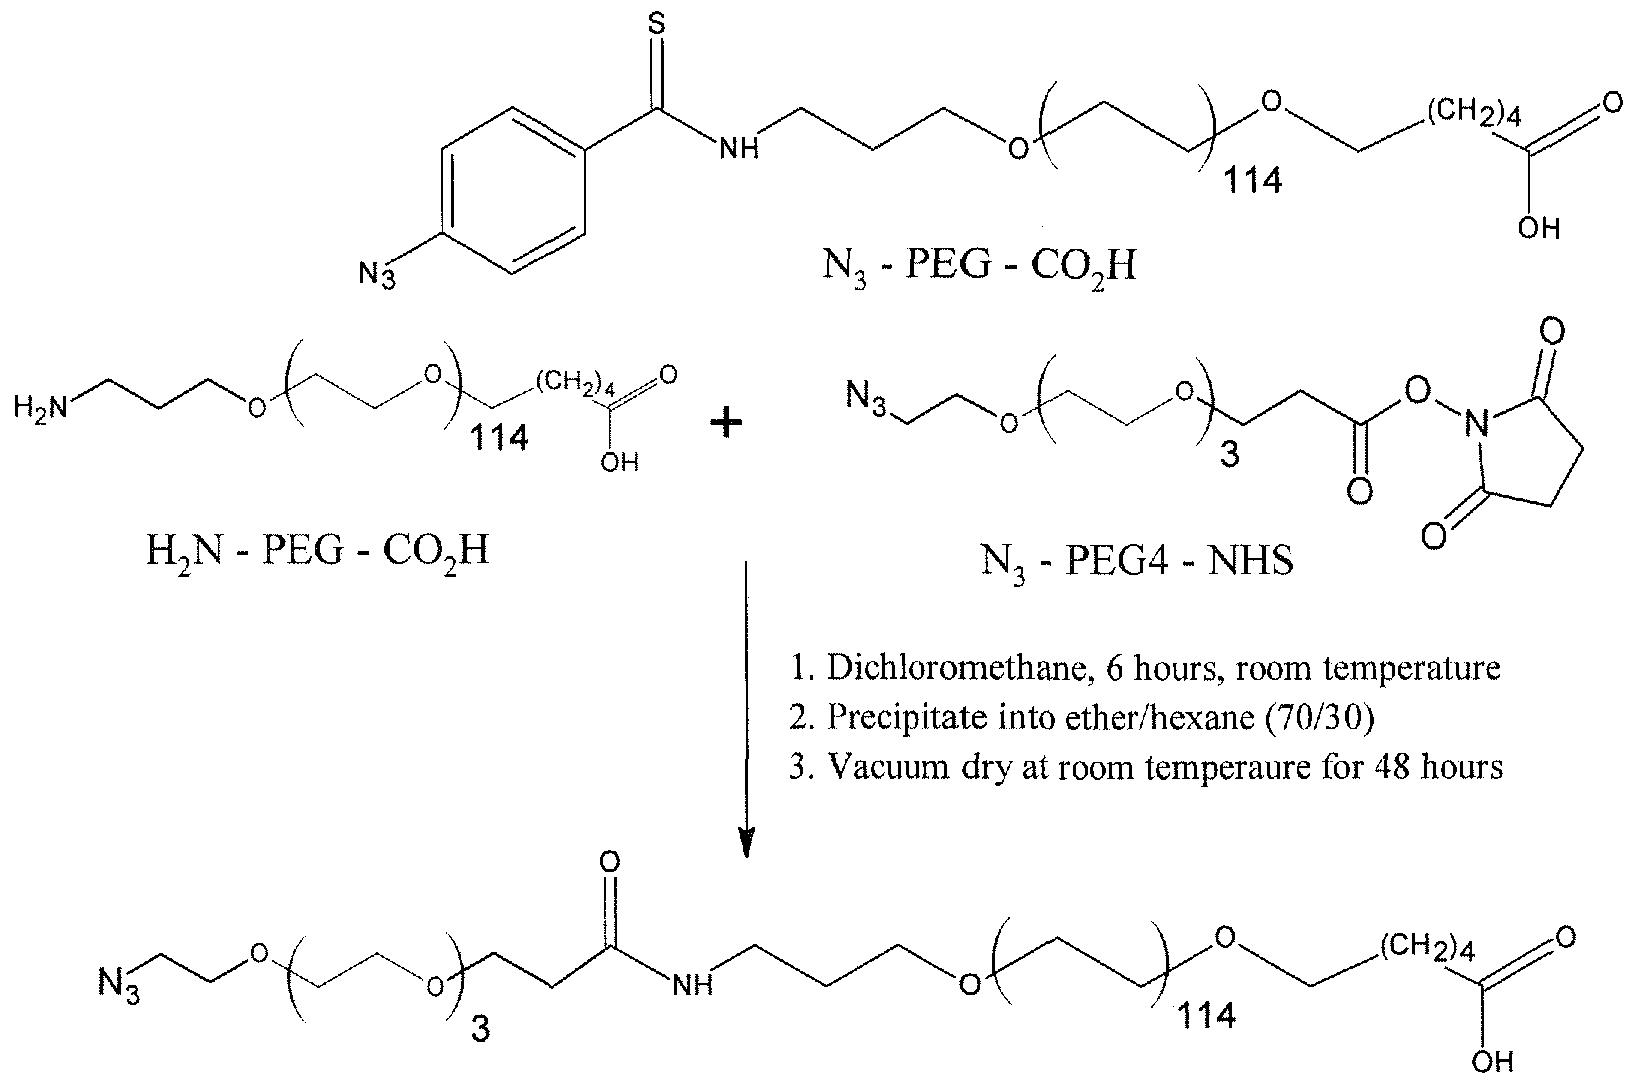 tetracycline compared to cleocin